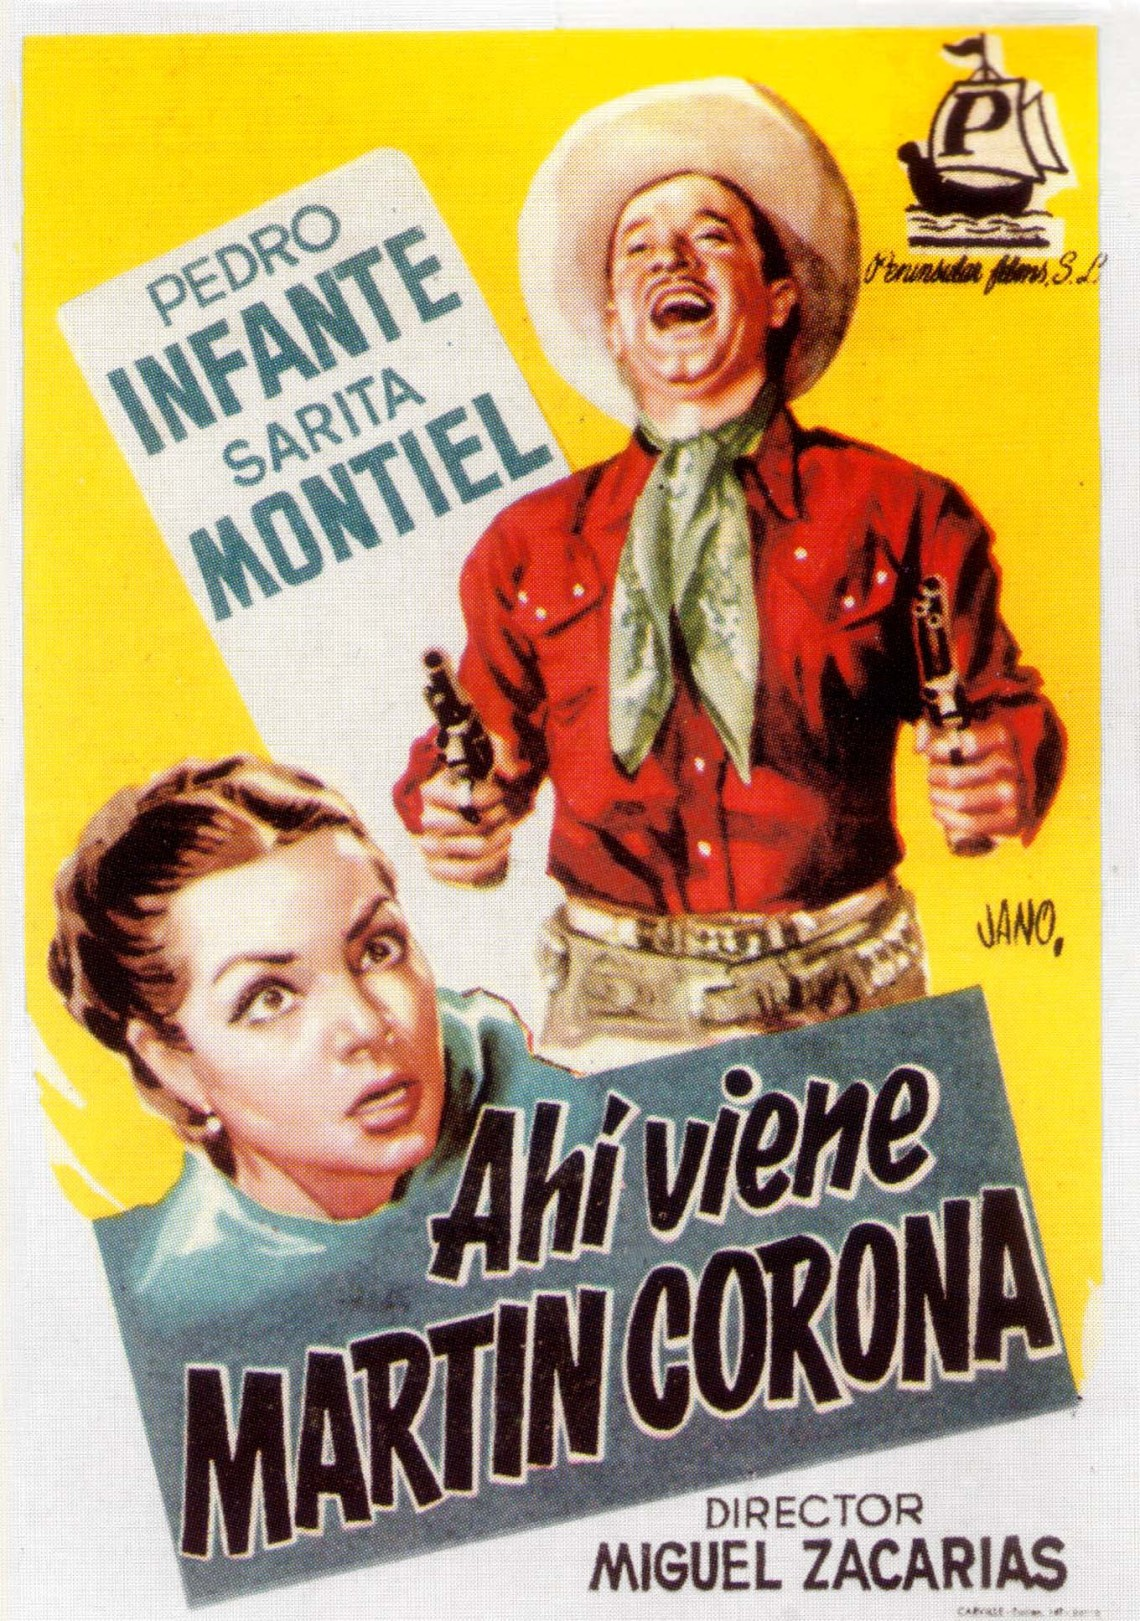 Martín Corona